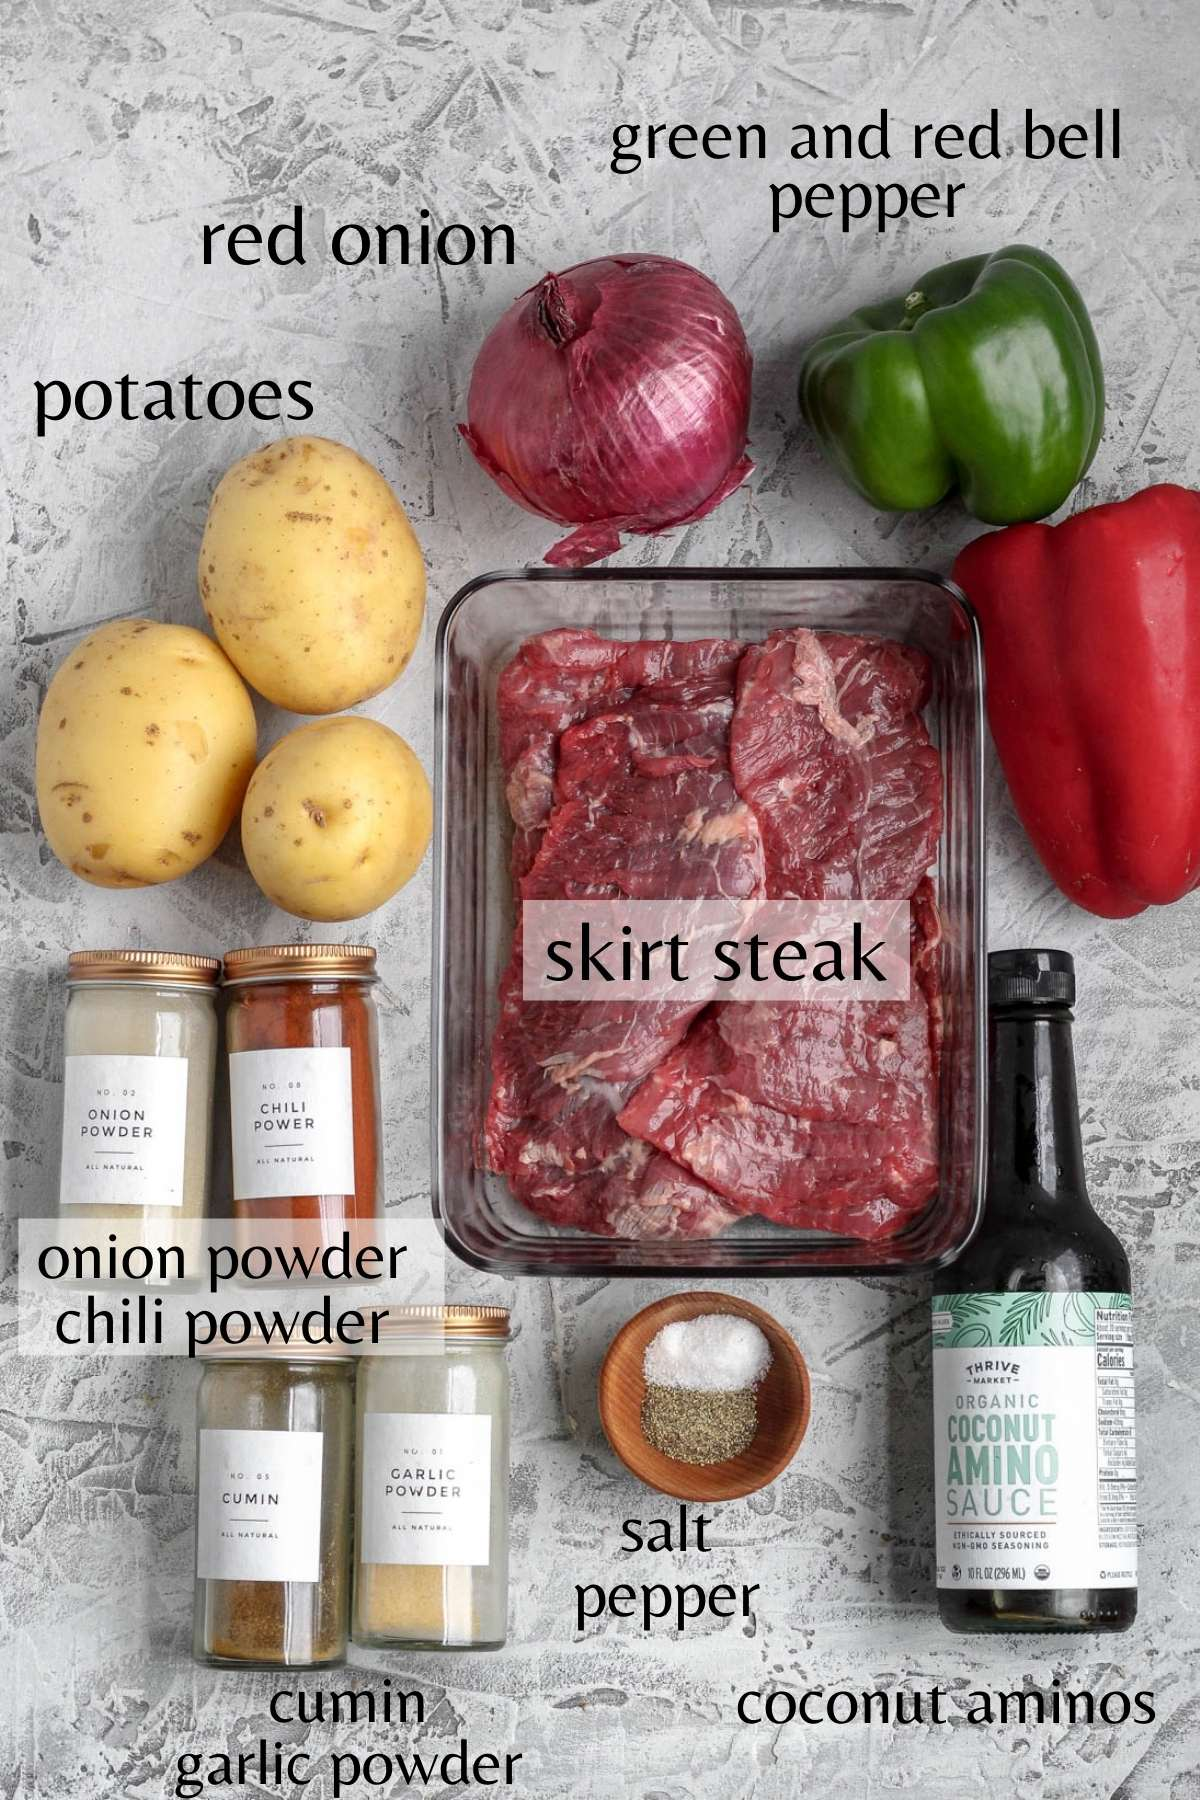 yukong gold potatoes, a red onion, a green bell pepper, coconut aminos. skirt steak, salt, pepper, onion powder, chili powder, cumin, and garlic powder all laying on a flat bakground